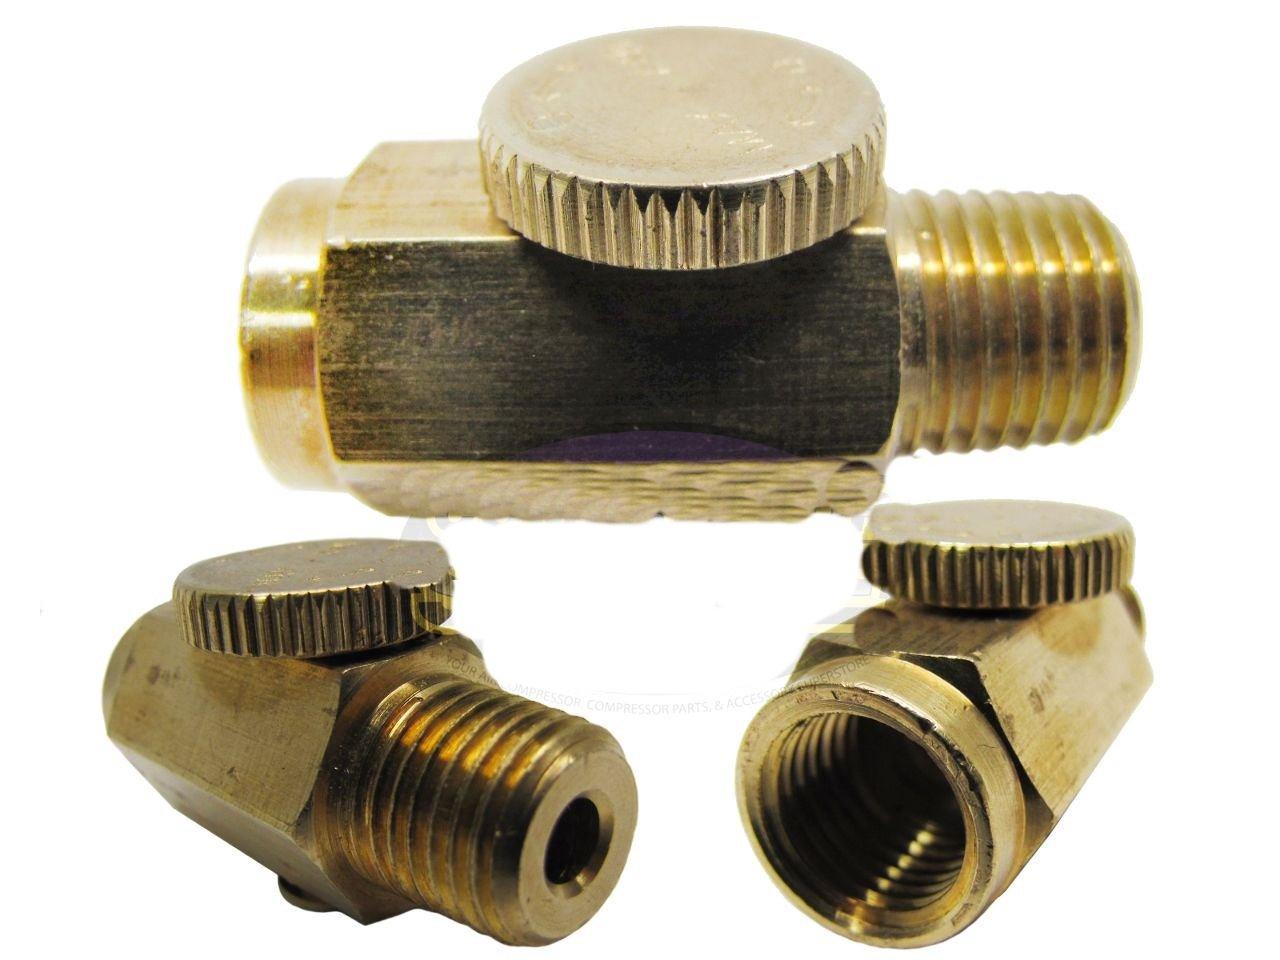 1/4 NPT Inline Regulator Solid Brass Compressed Air Pressure Valve Tool New Air Compressor